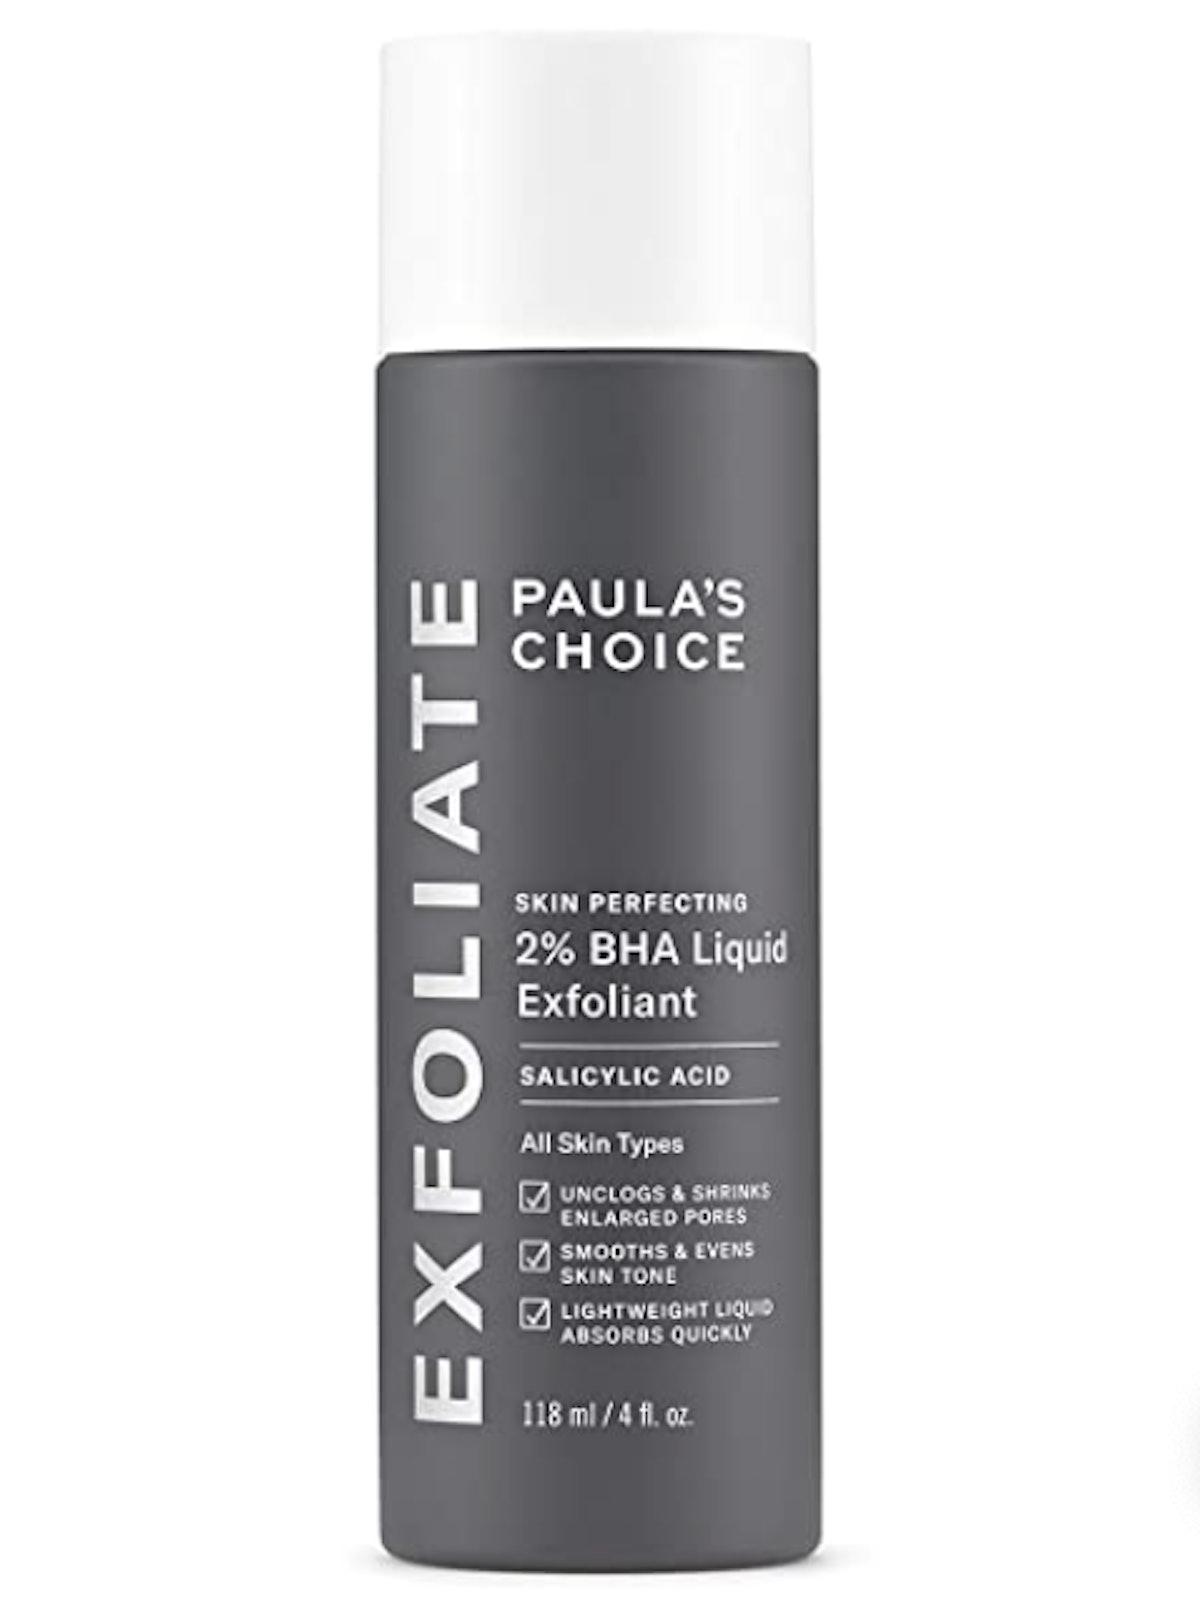 Paulas Choice 2% Liquid Exfoliant